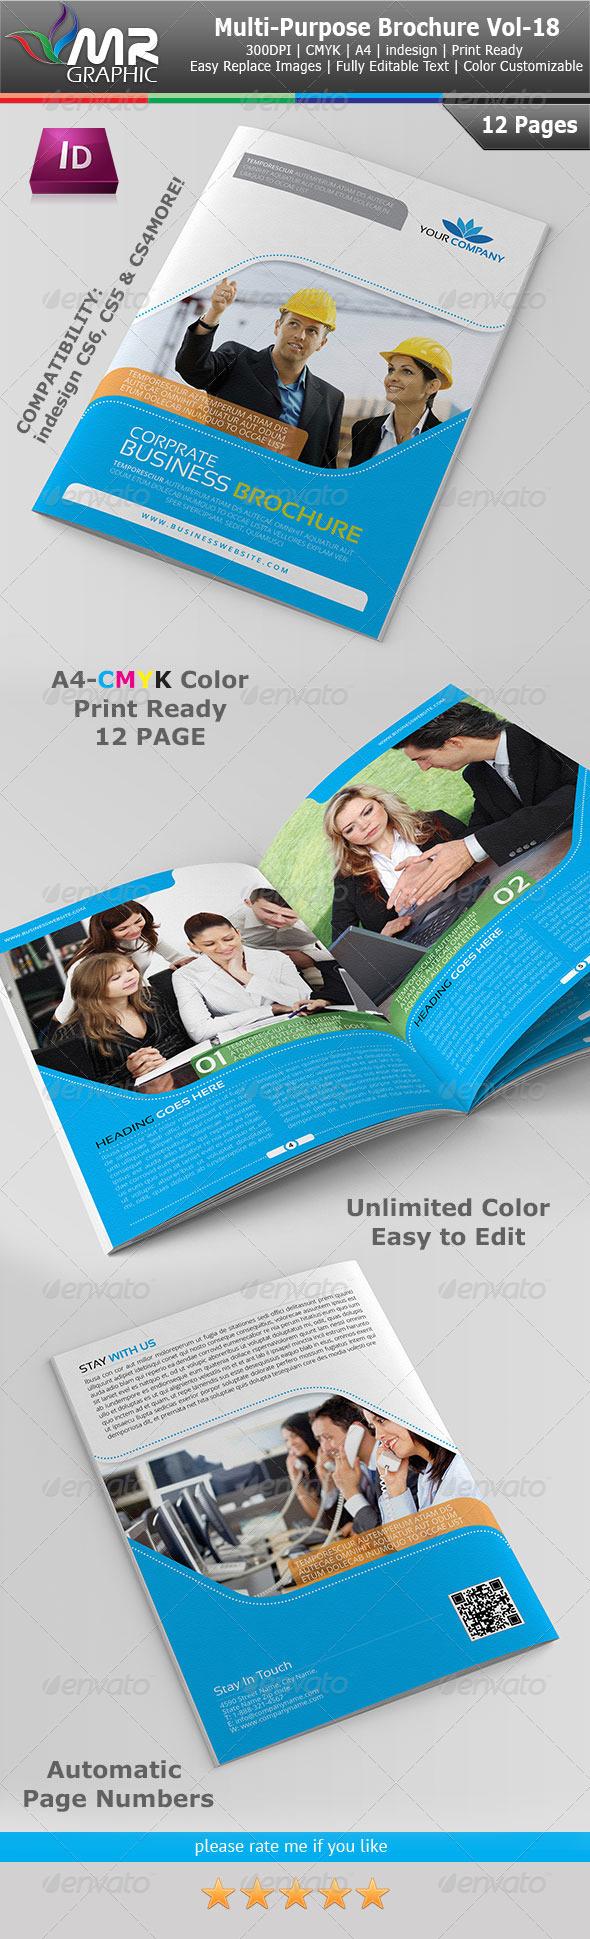 Multipurpose Business Brochure Template Vol-18 - Corporate Brochures